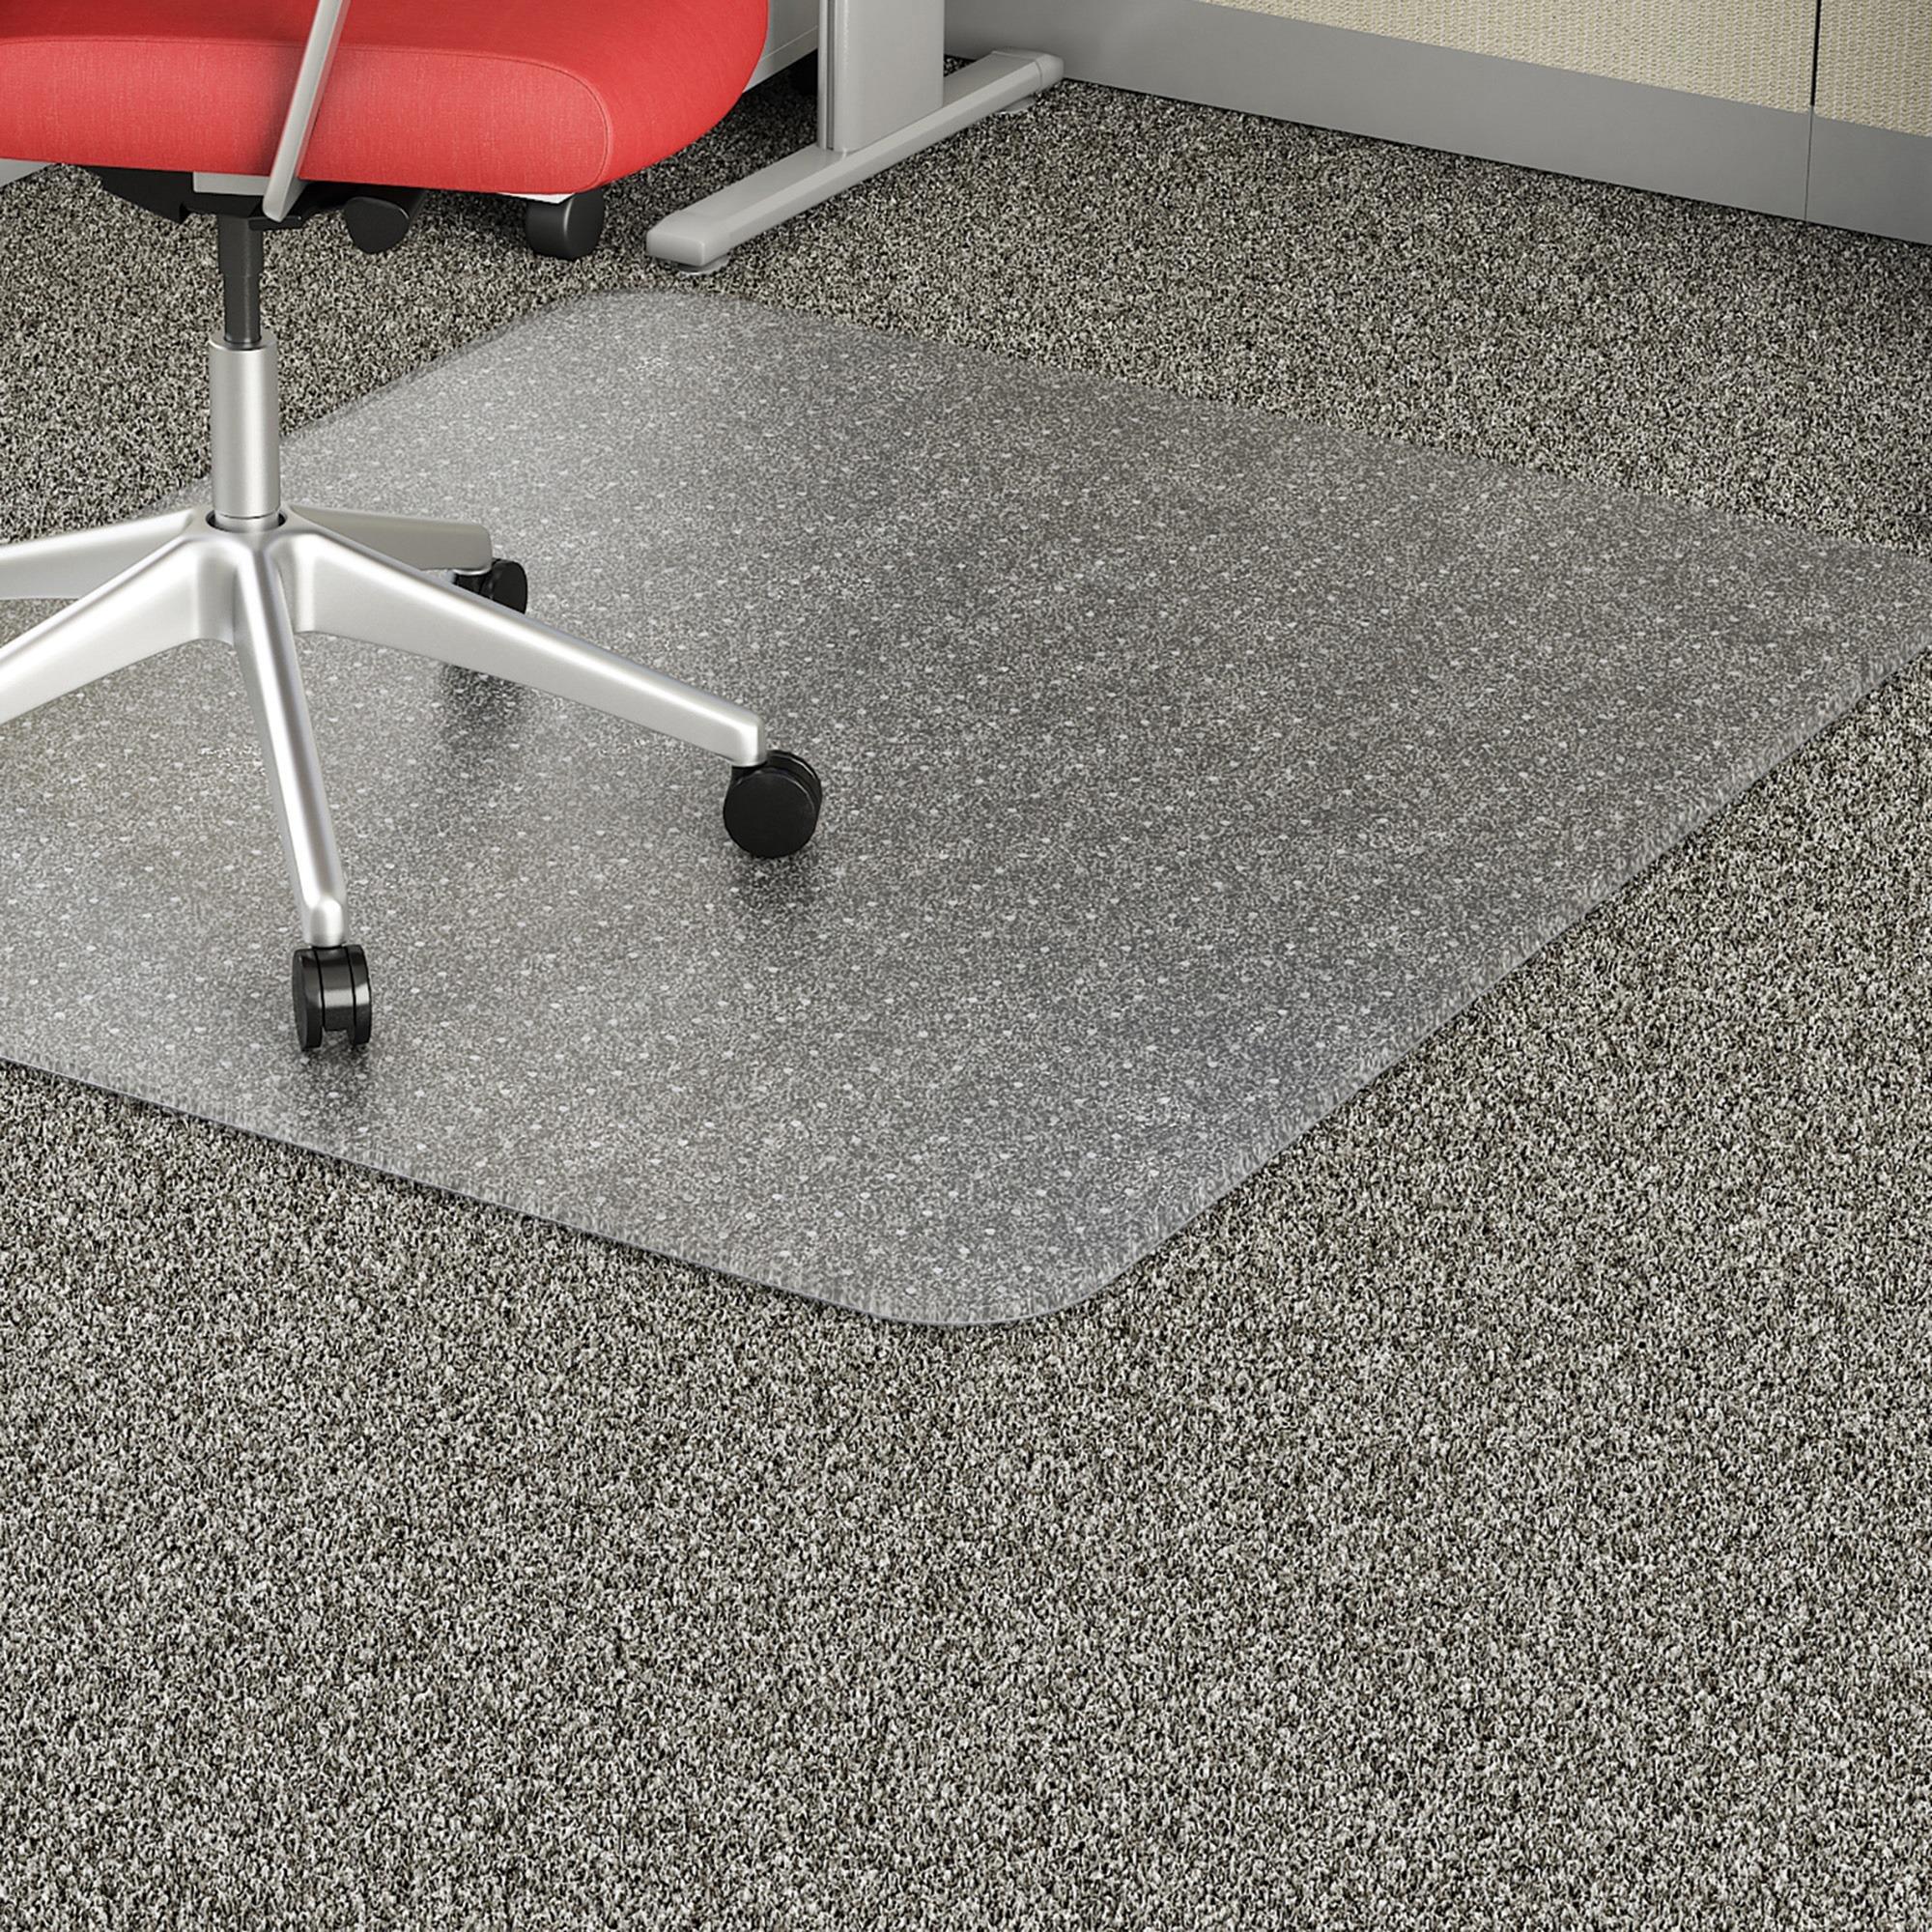 Lorell Rectangular Low-pile Economy Chairmat - Carpeted Floor - 60